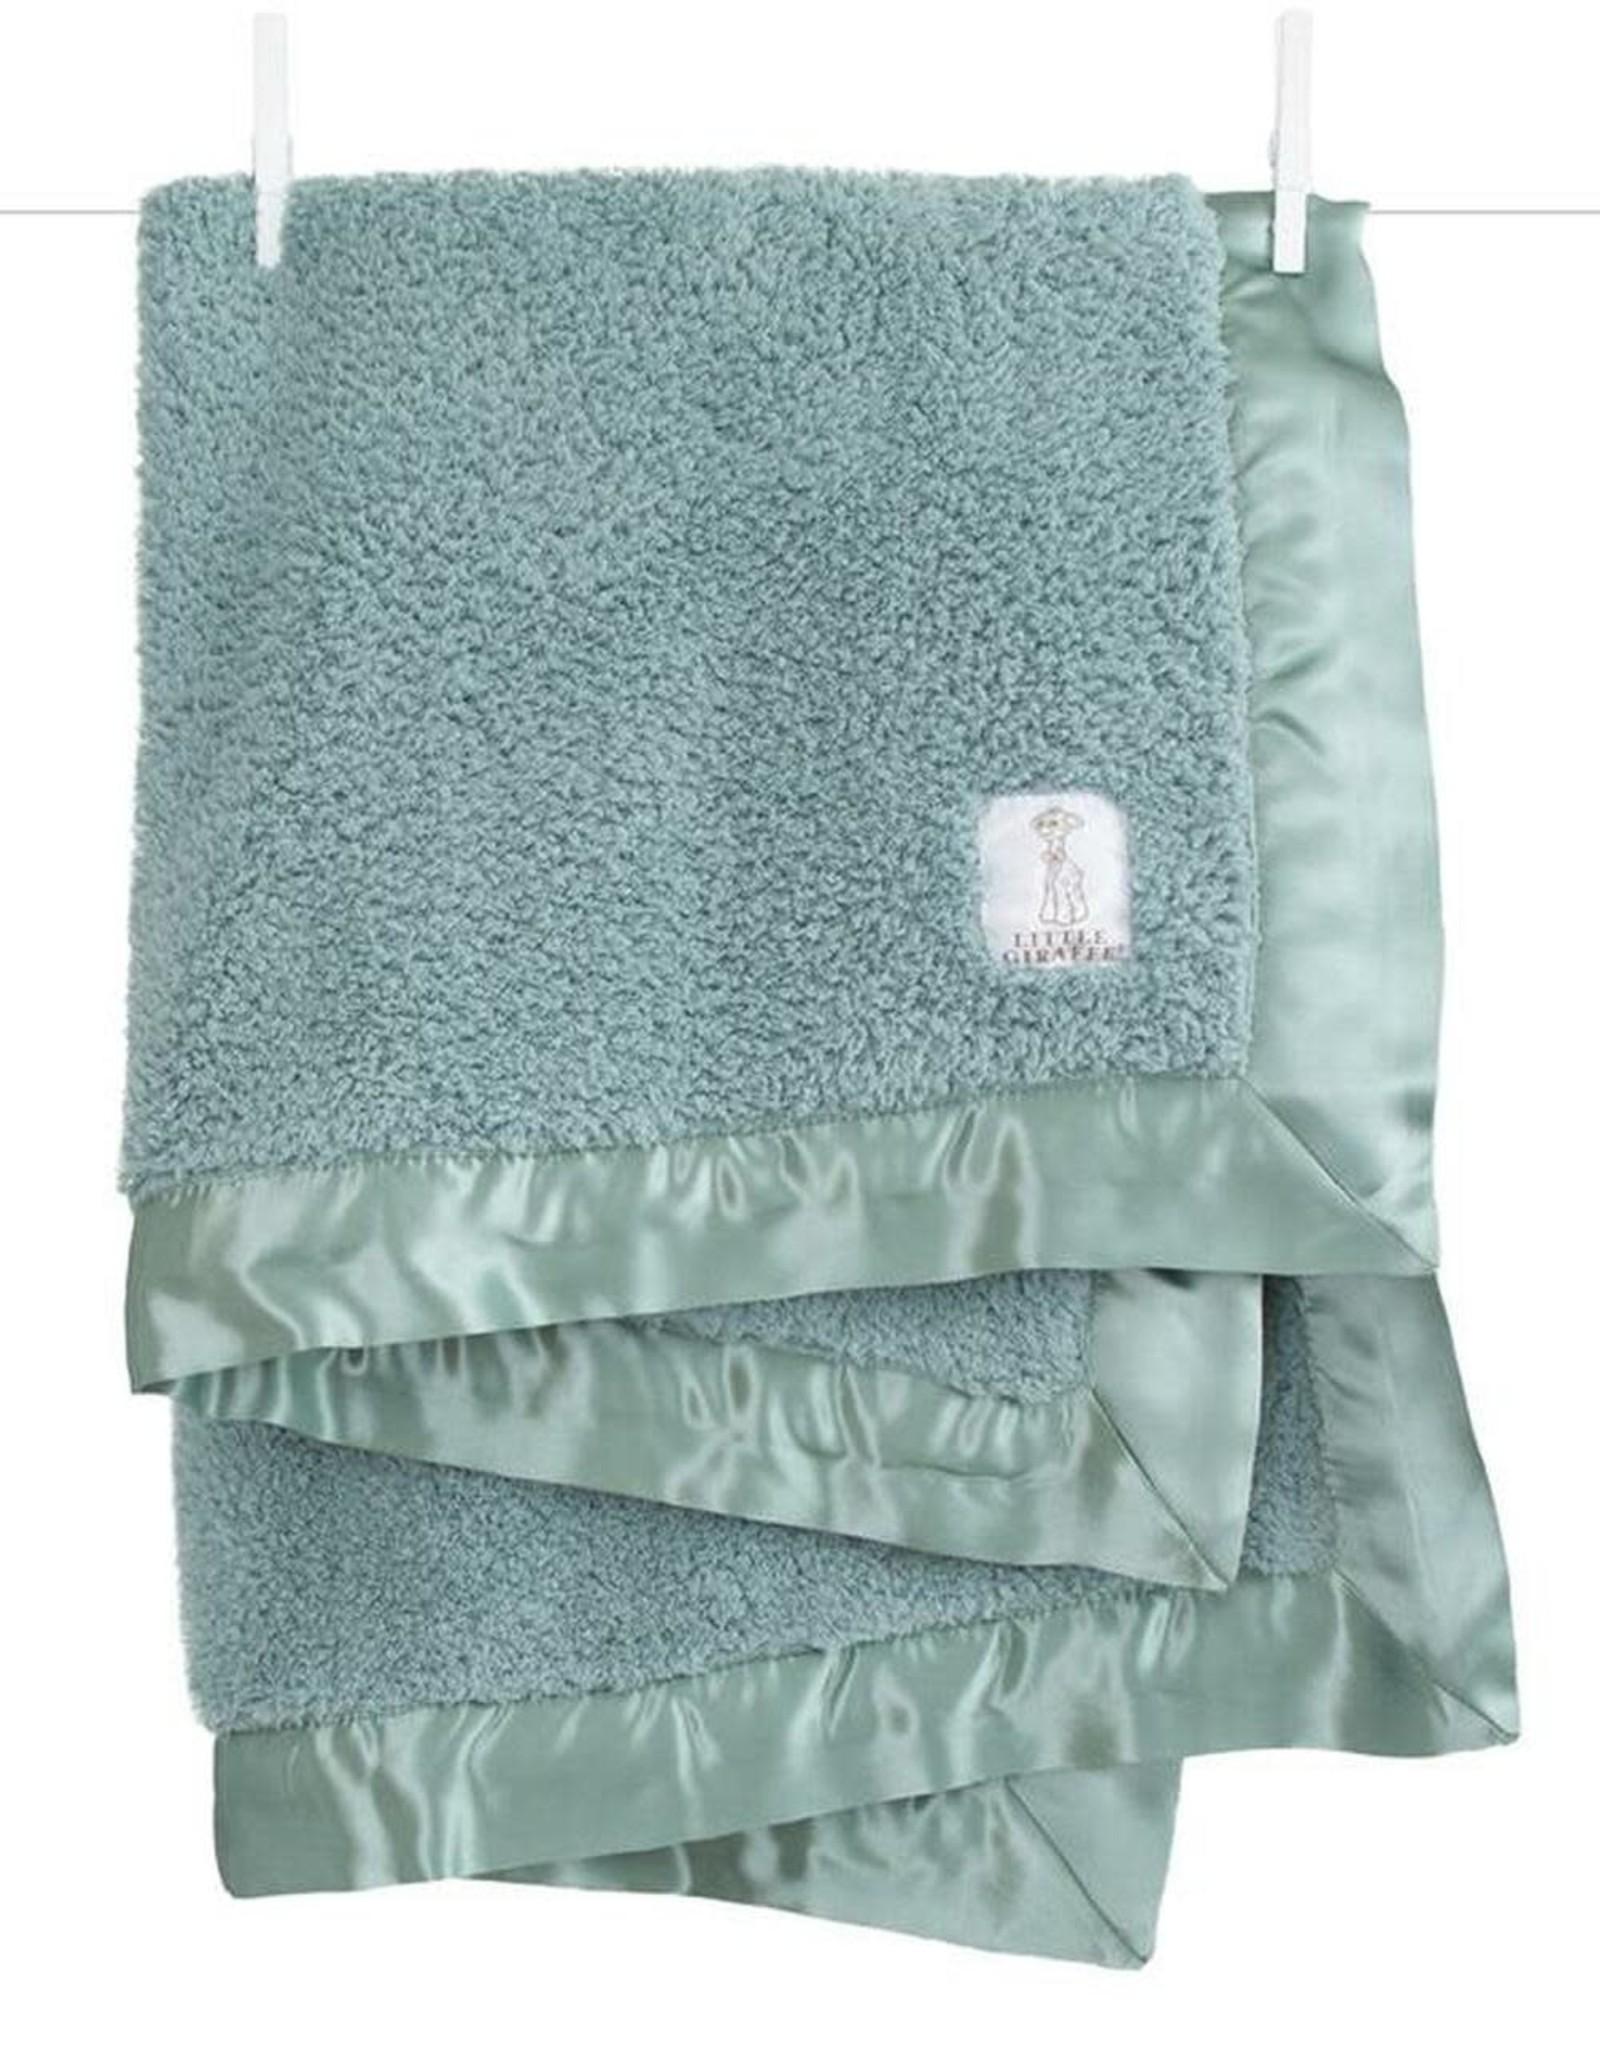 Little Giraffe Chenille Blanket Sage